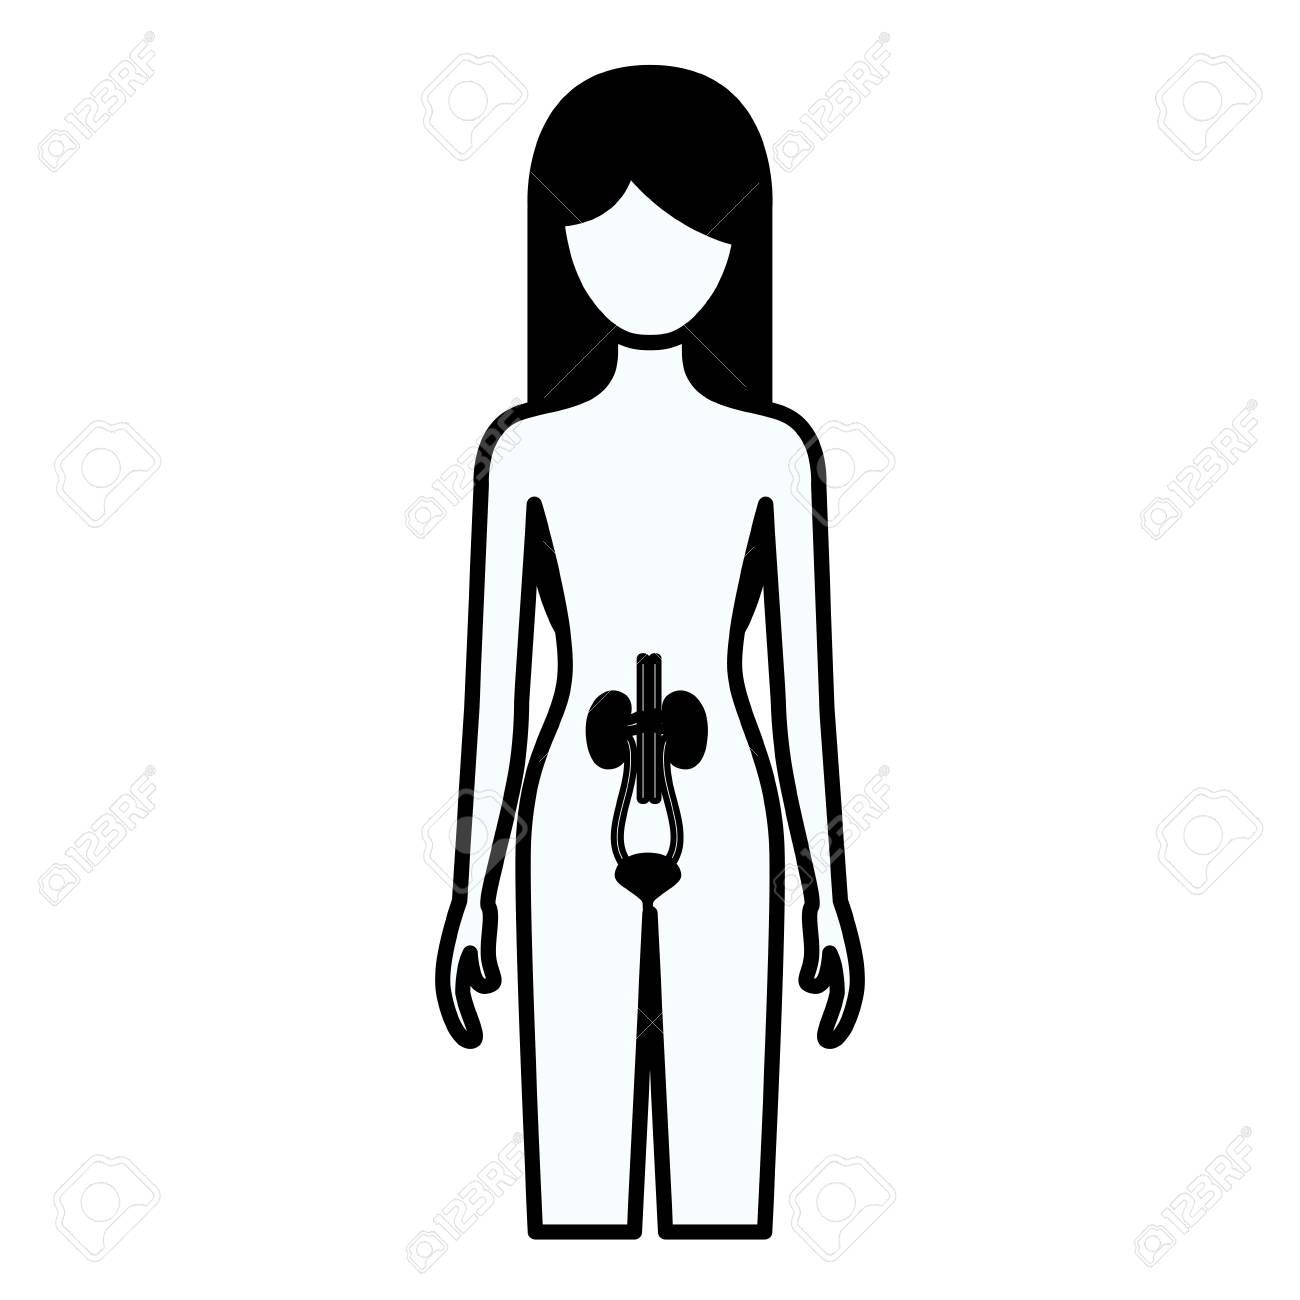 Contorno Negro Silueta Gruesa De La Persona Femenina Con La ...